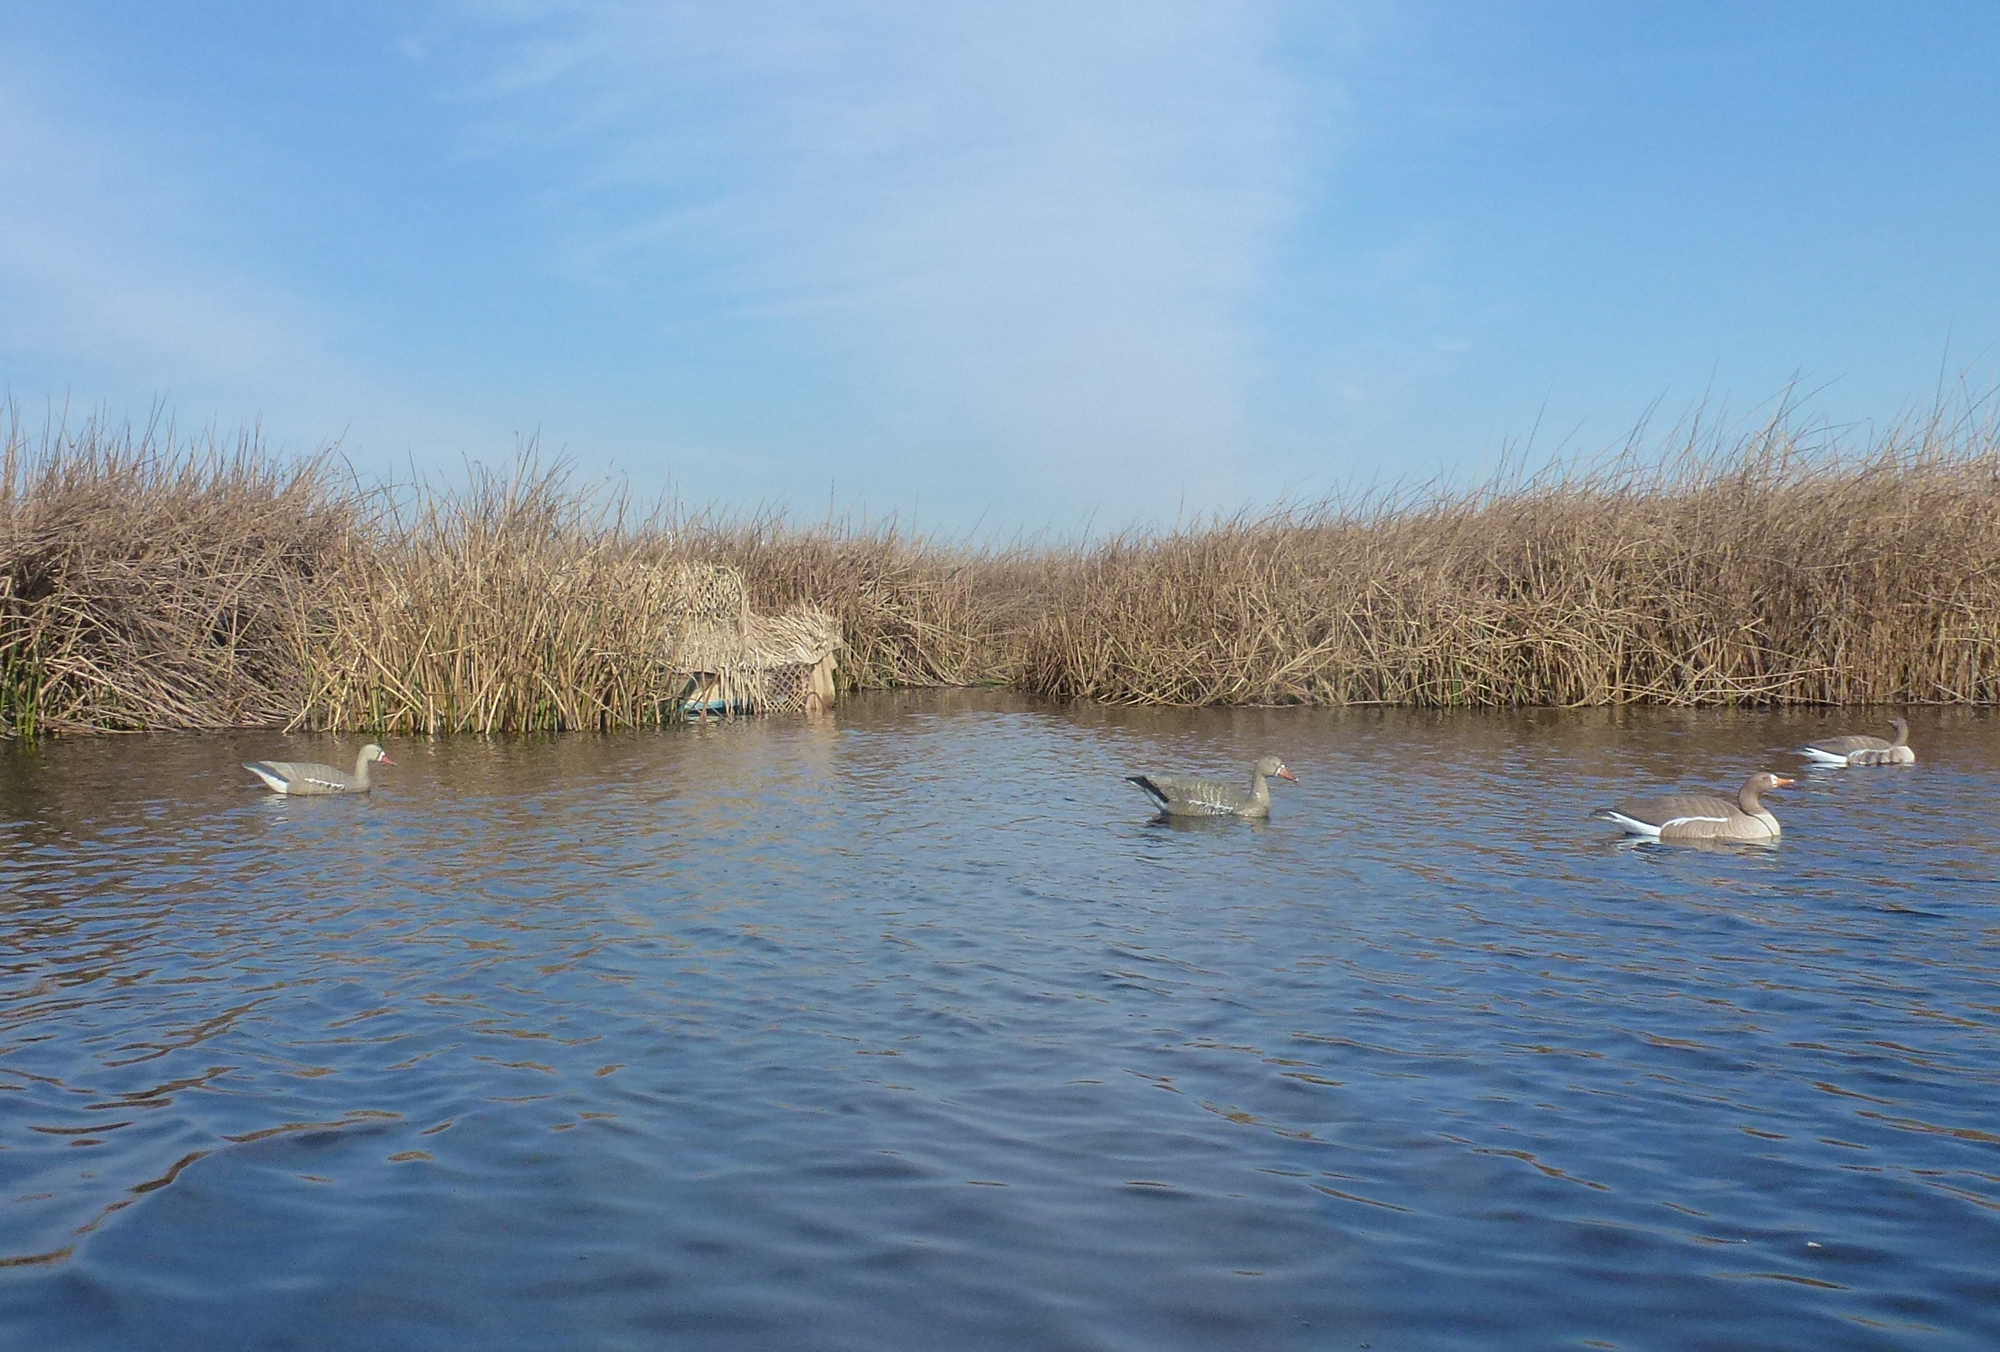 luxury rich plans images pontoon fletcher duck of cabin best boat blind s blinds